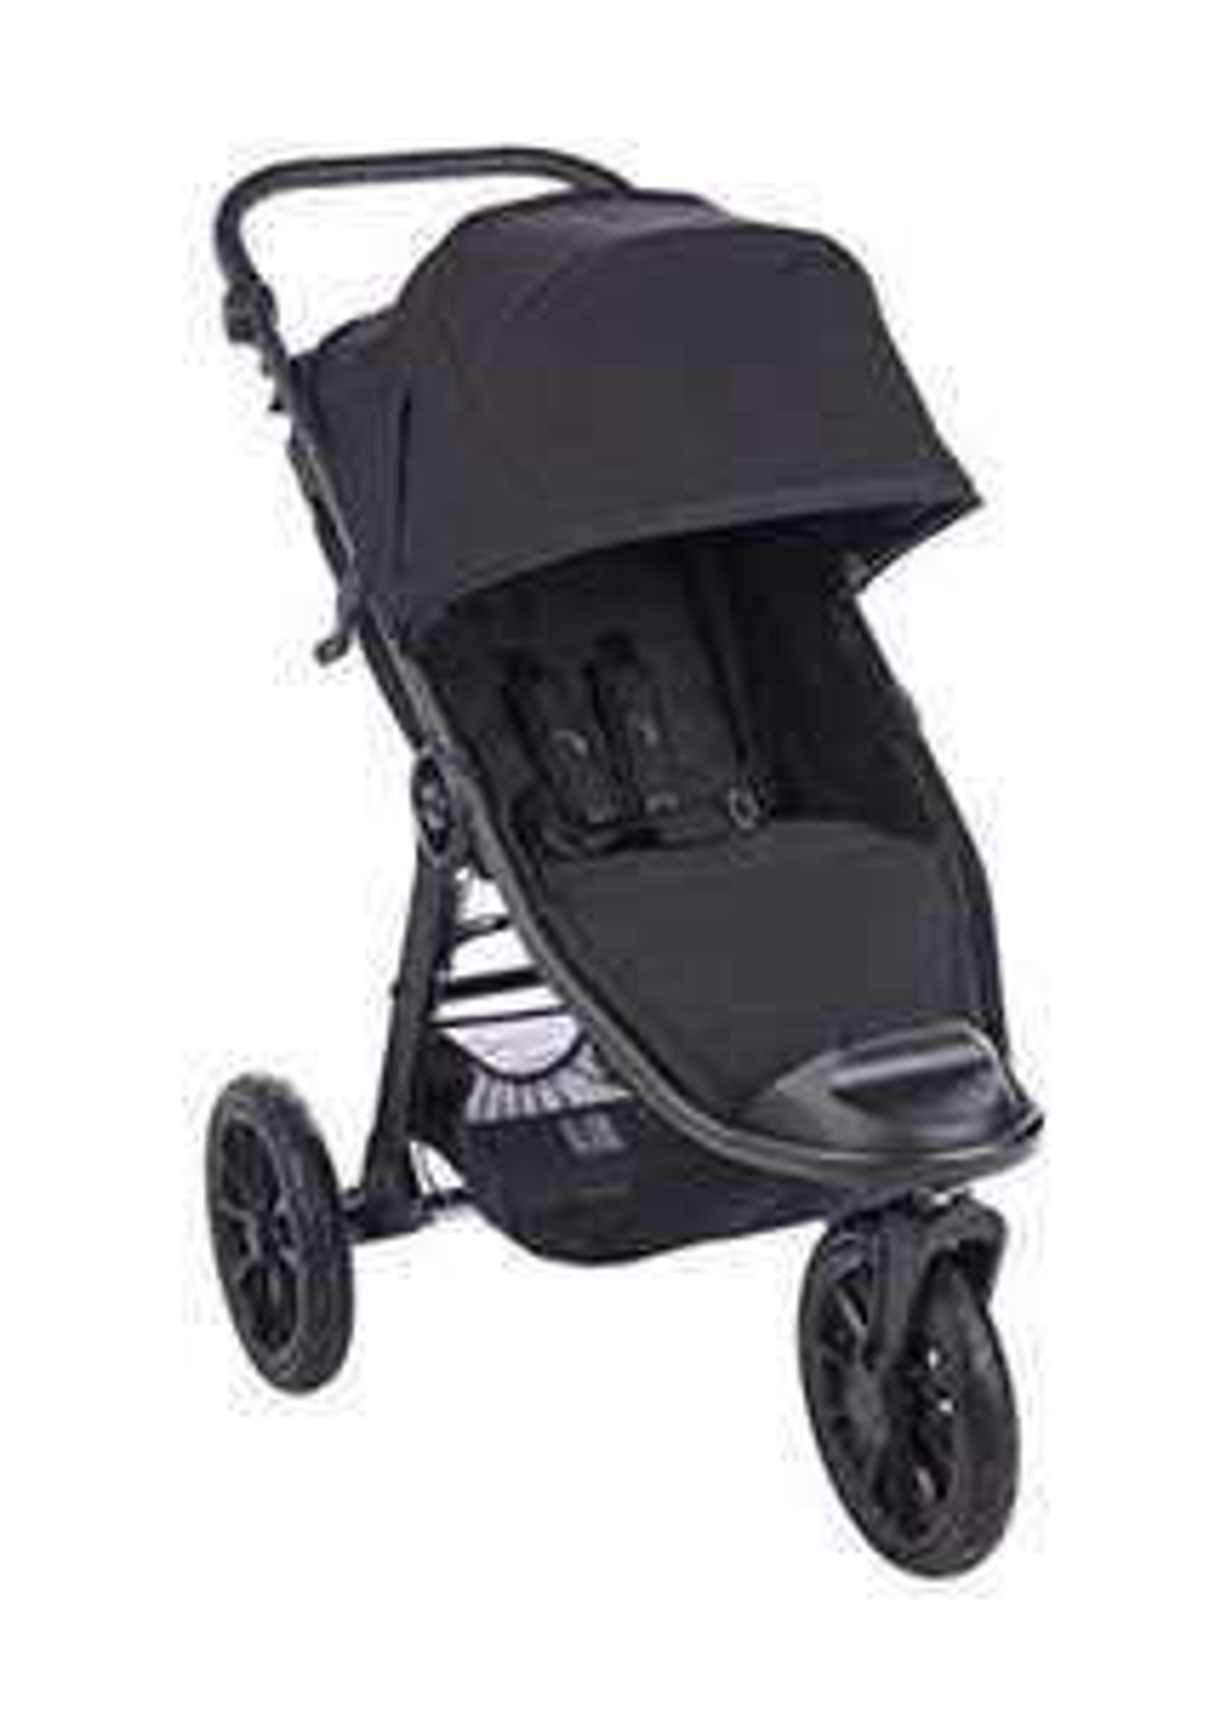 Baby Jogger City Elite 2 All-Terrain Pushchair - £317.99 @ Amazon